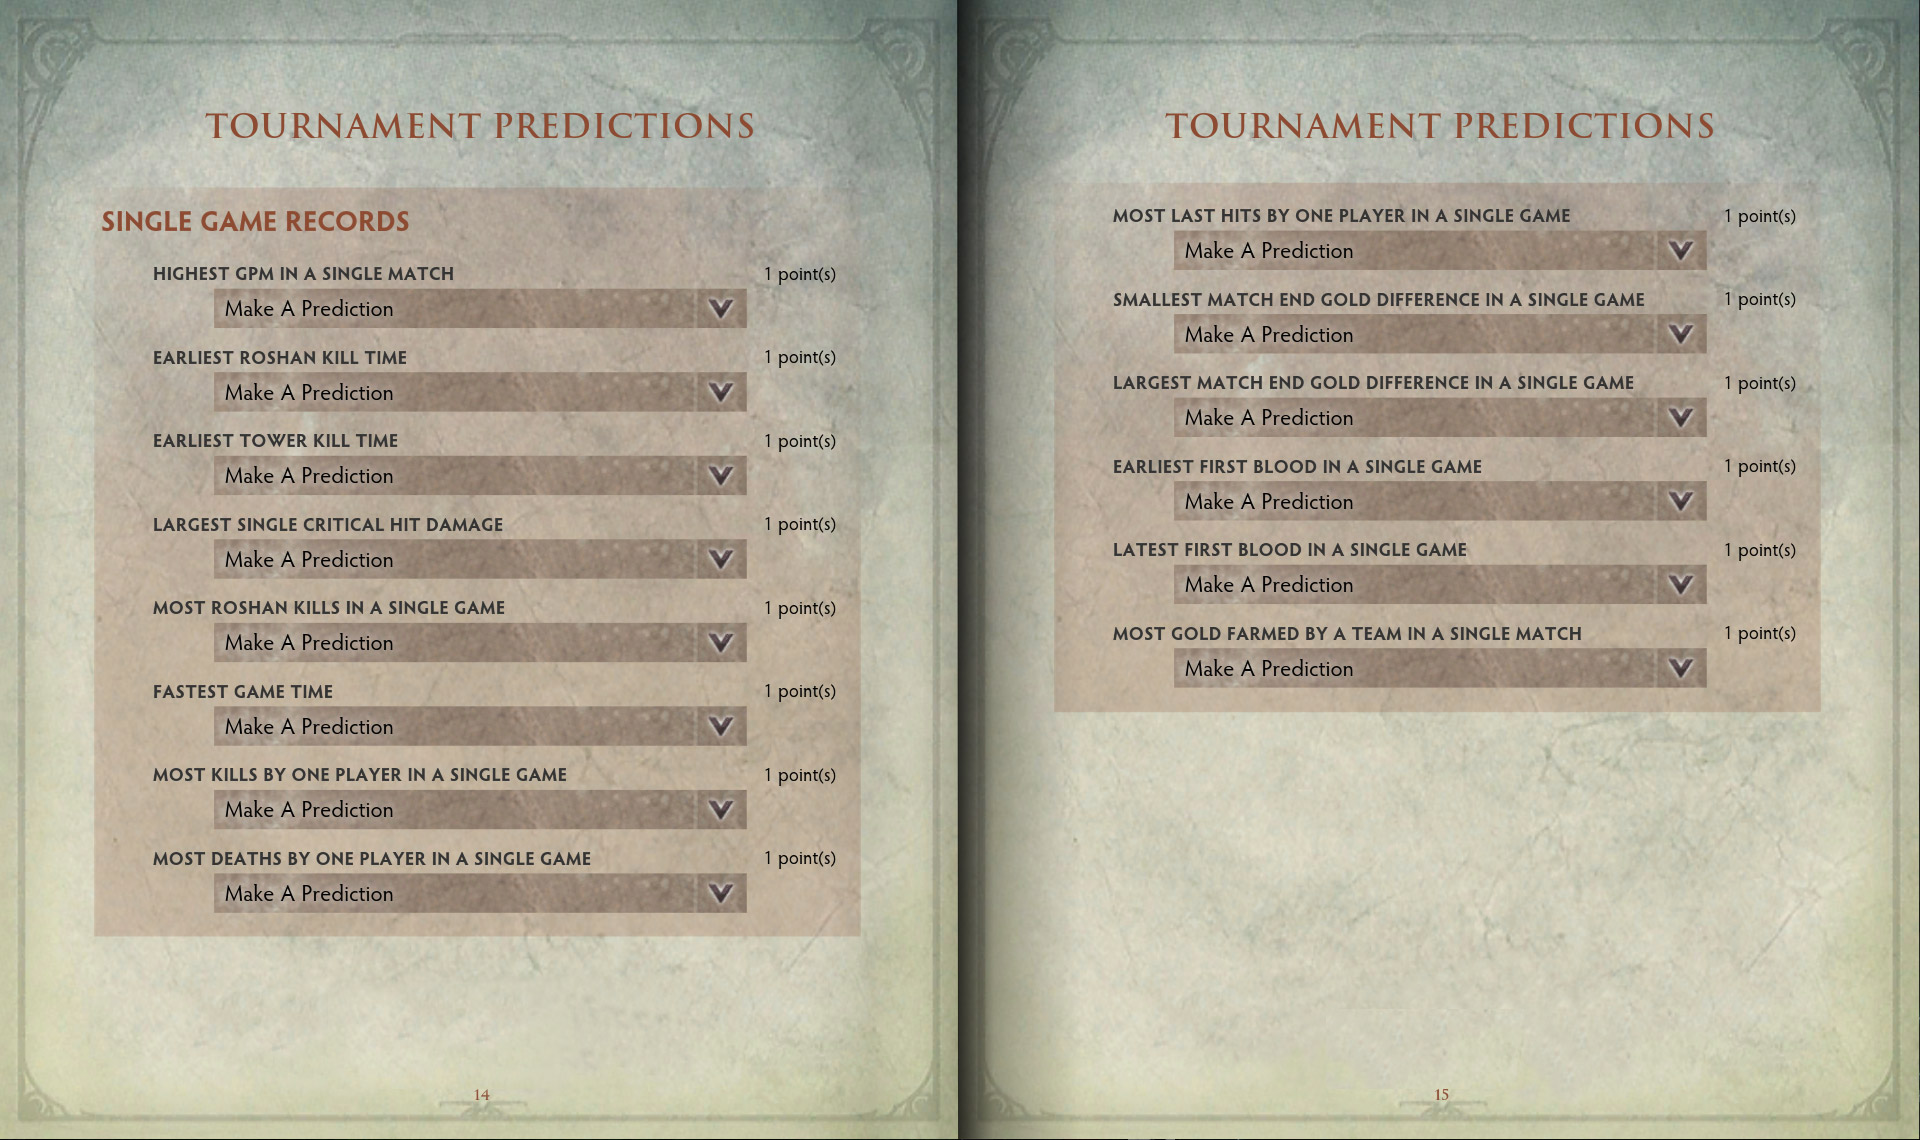 2013 World Predictions